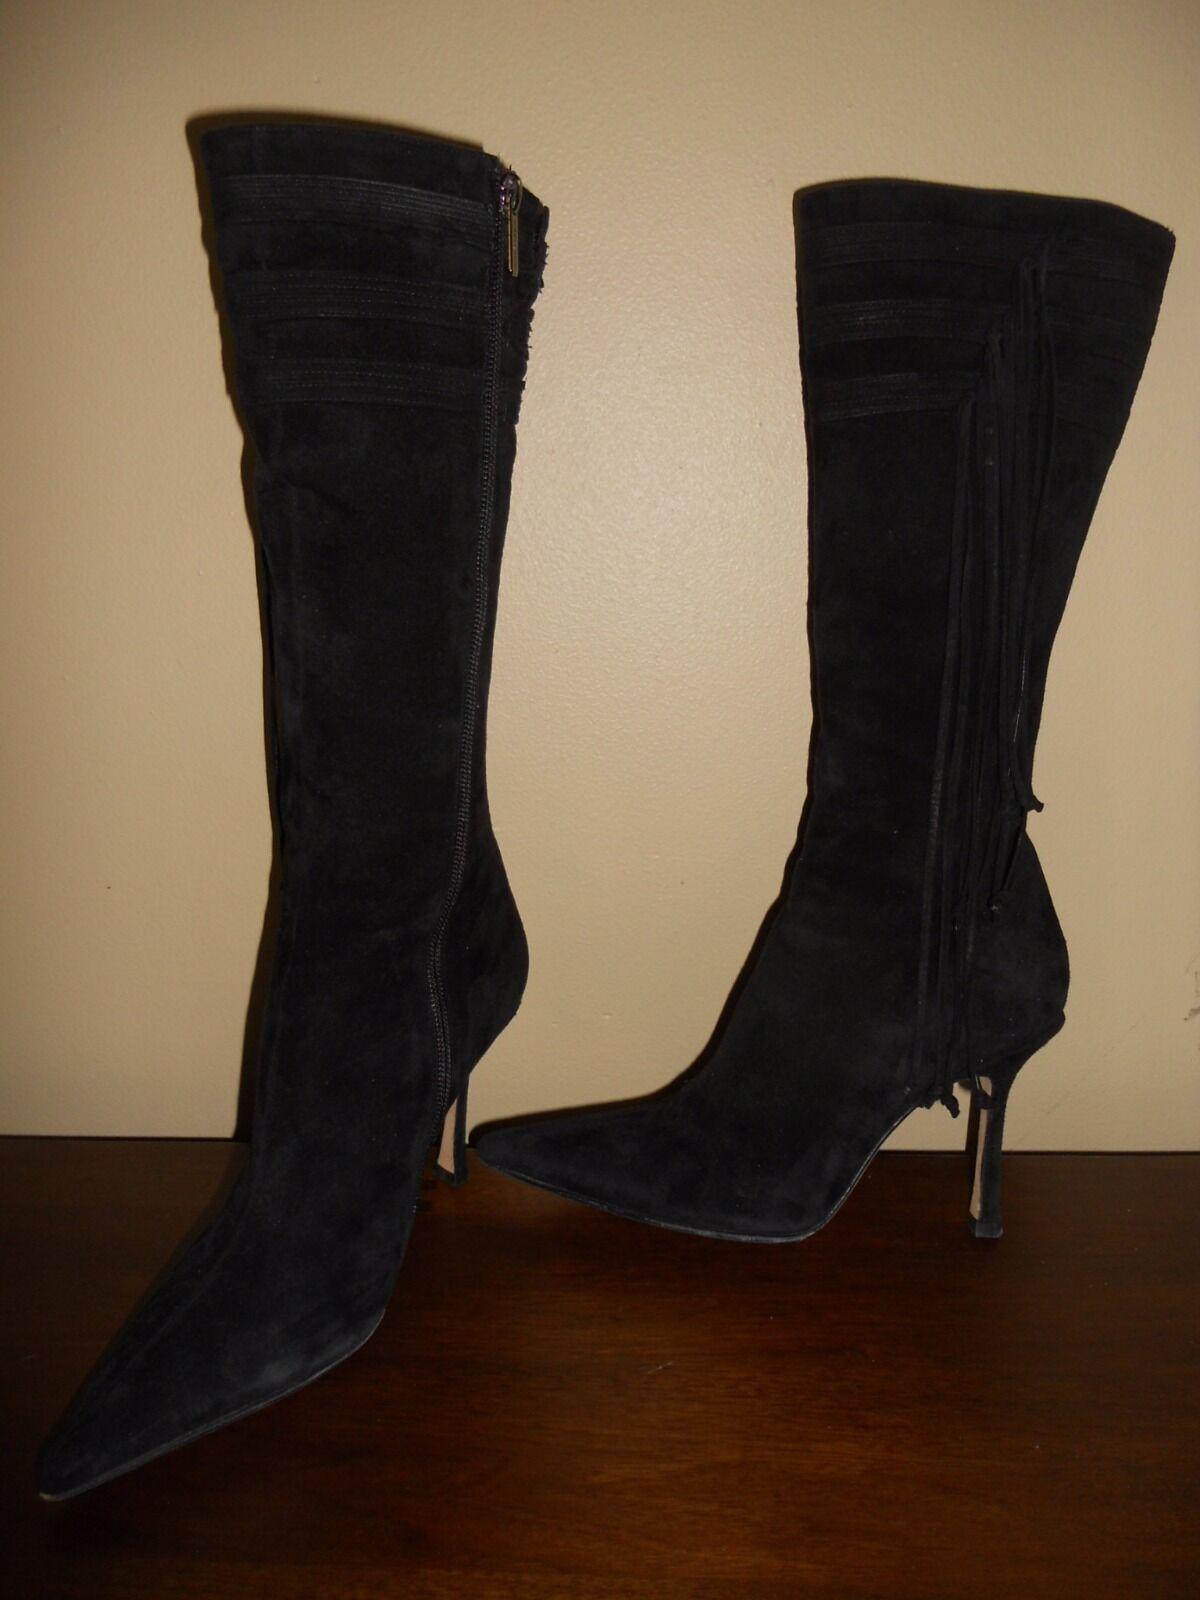 Jimmy Choo Black Knee High High High Suede Fringe Boots Size 36 ee33d2